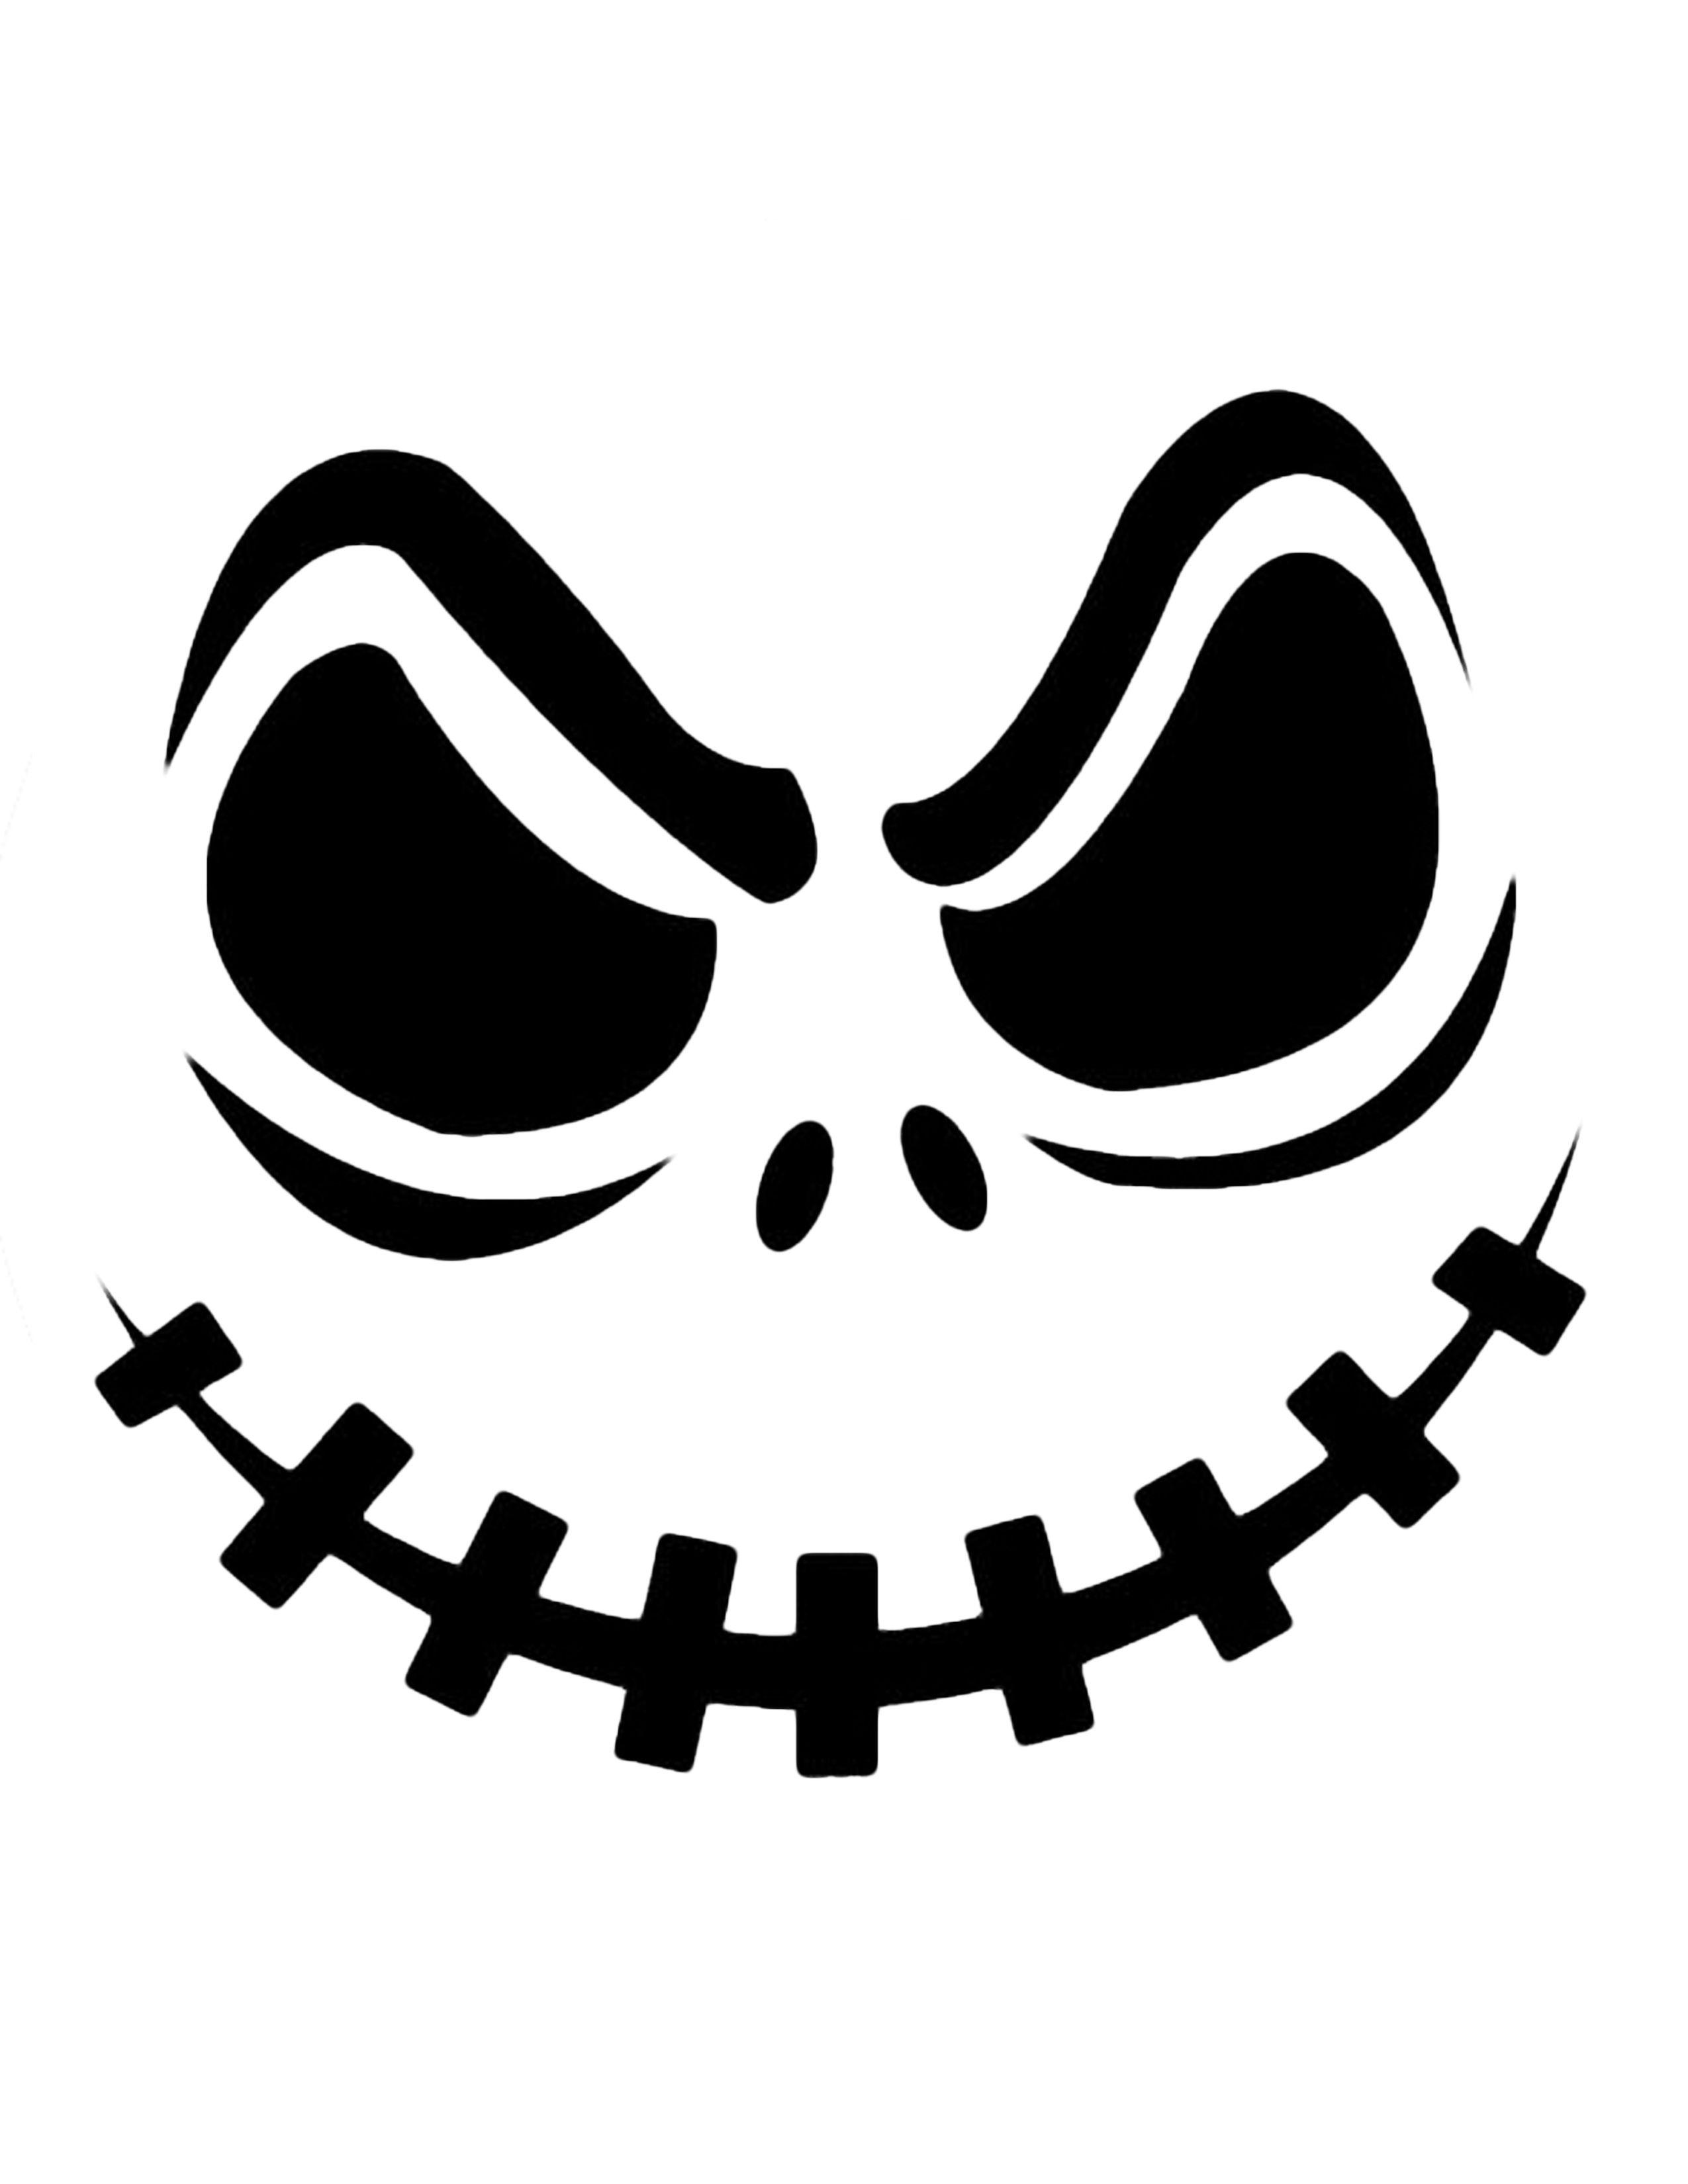 Free Printable Pumpkin Stencil | Stencils | Halloween Pumpkin - Free Printable Pumpkin Patterns